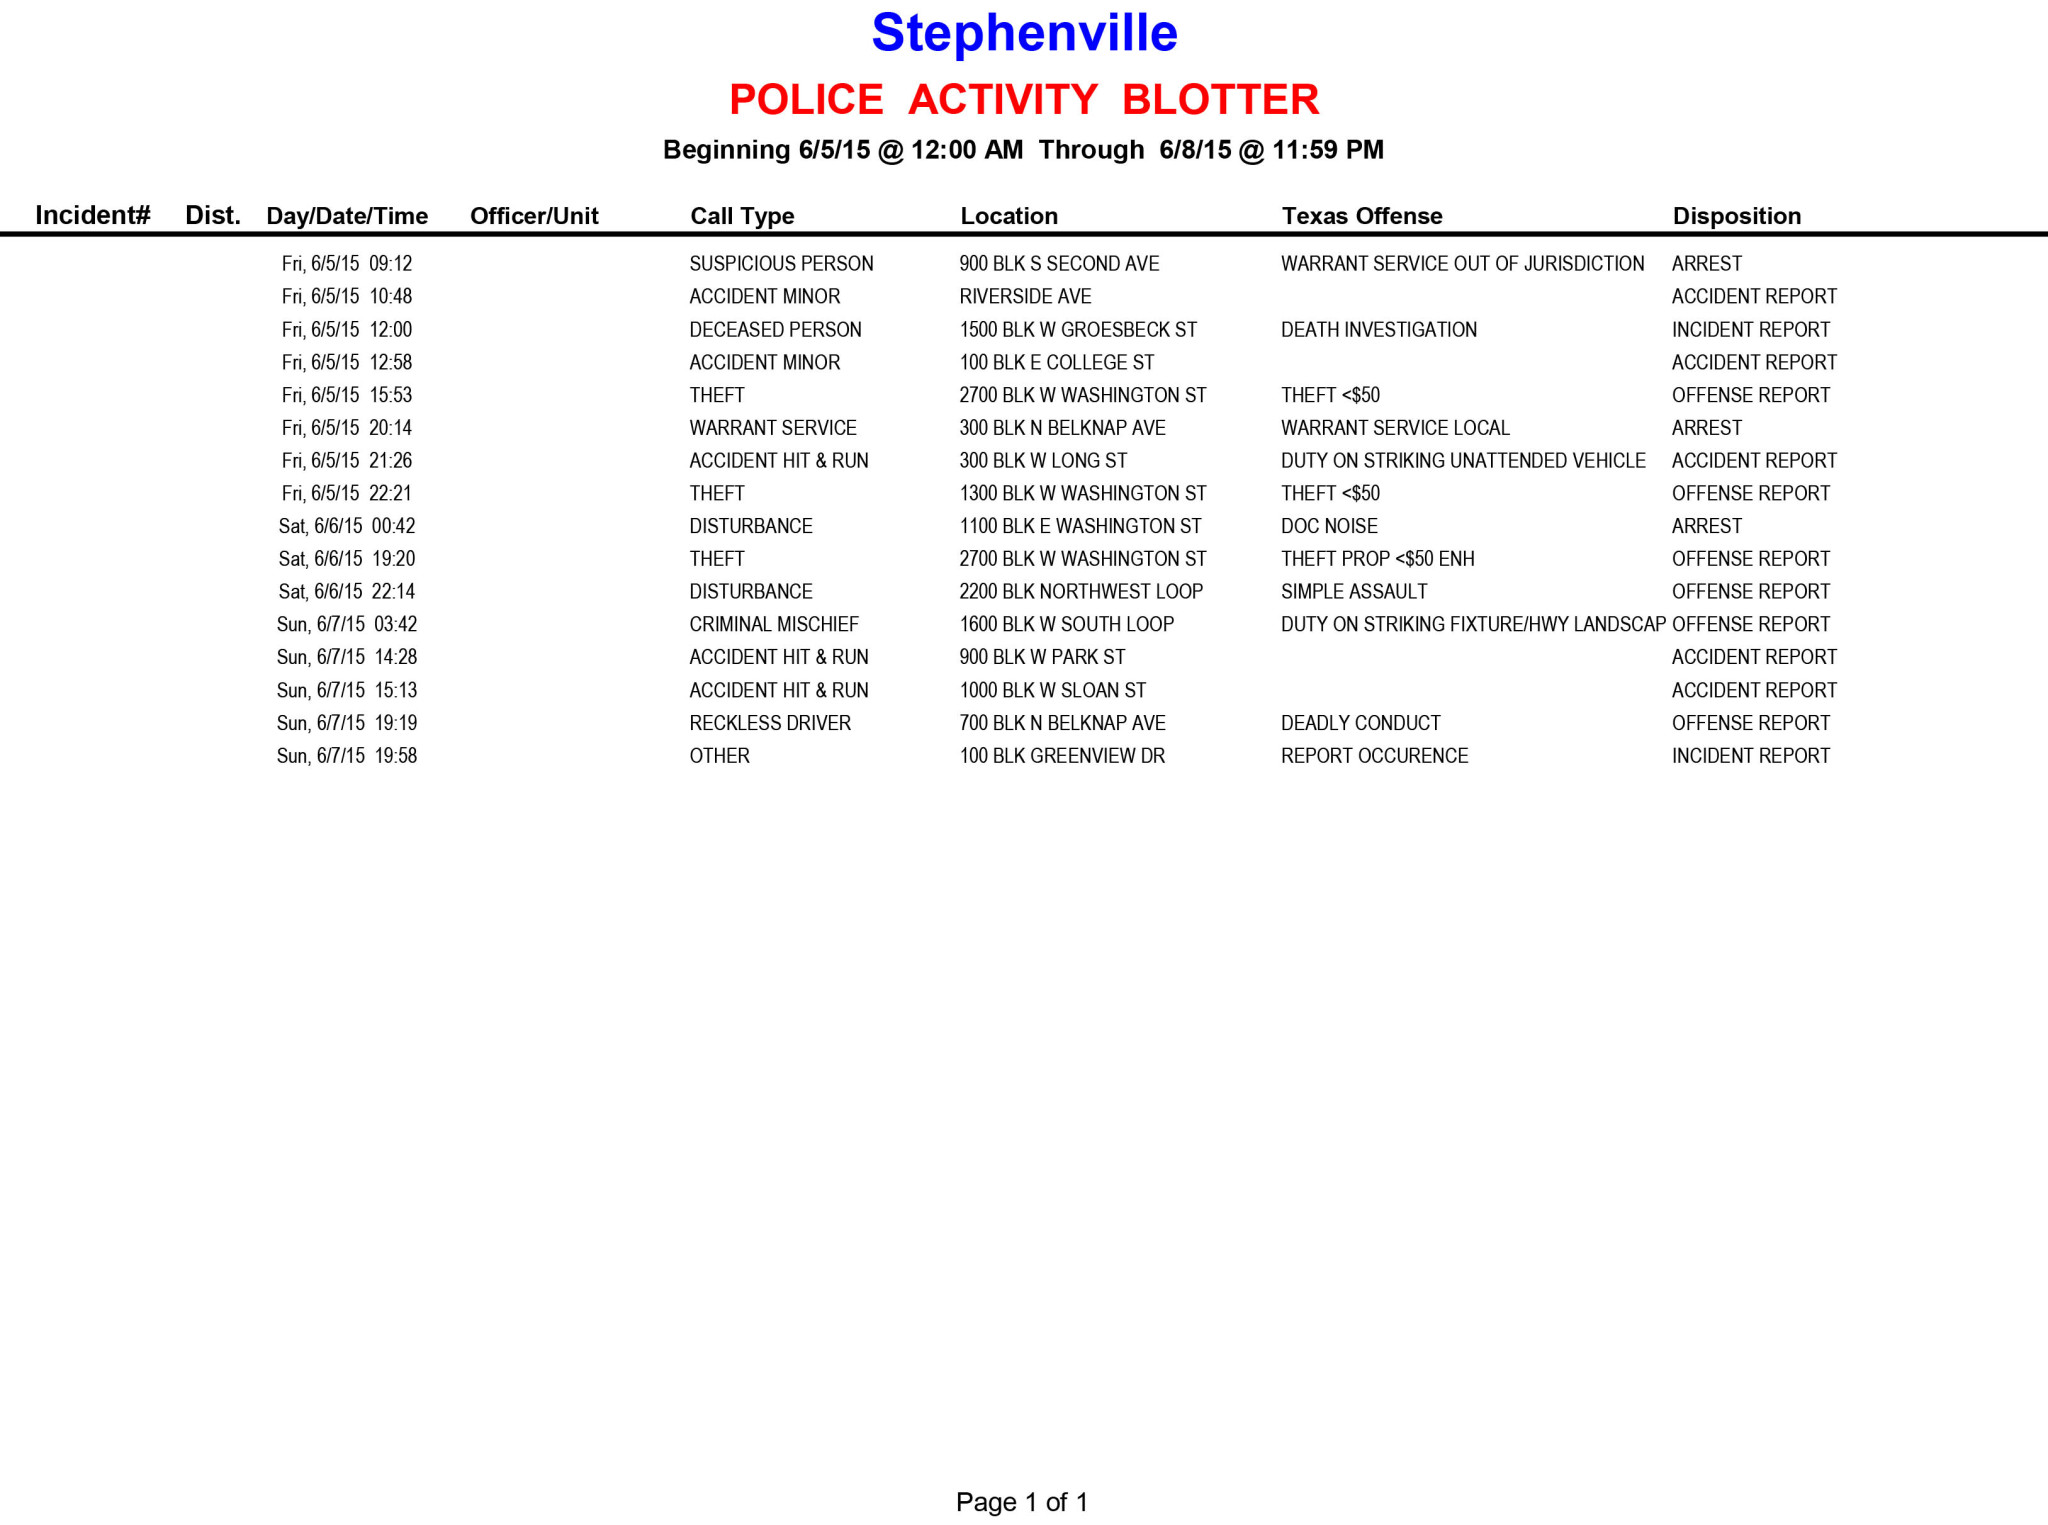 20150605-0608 Police Activity Blotter